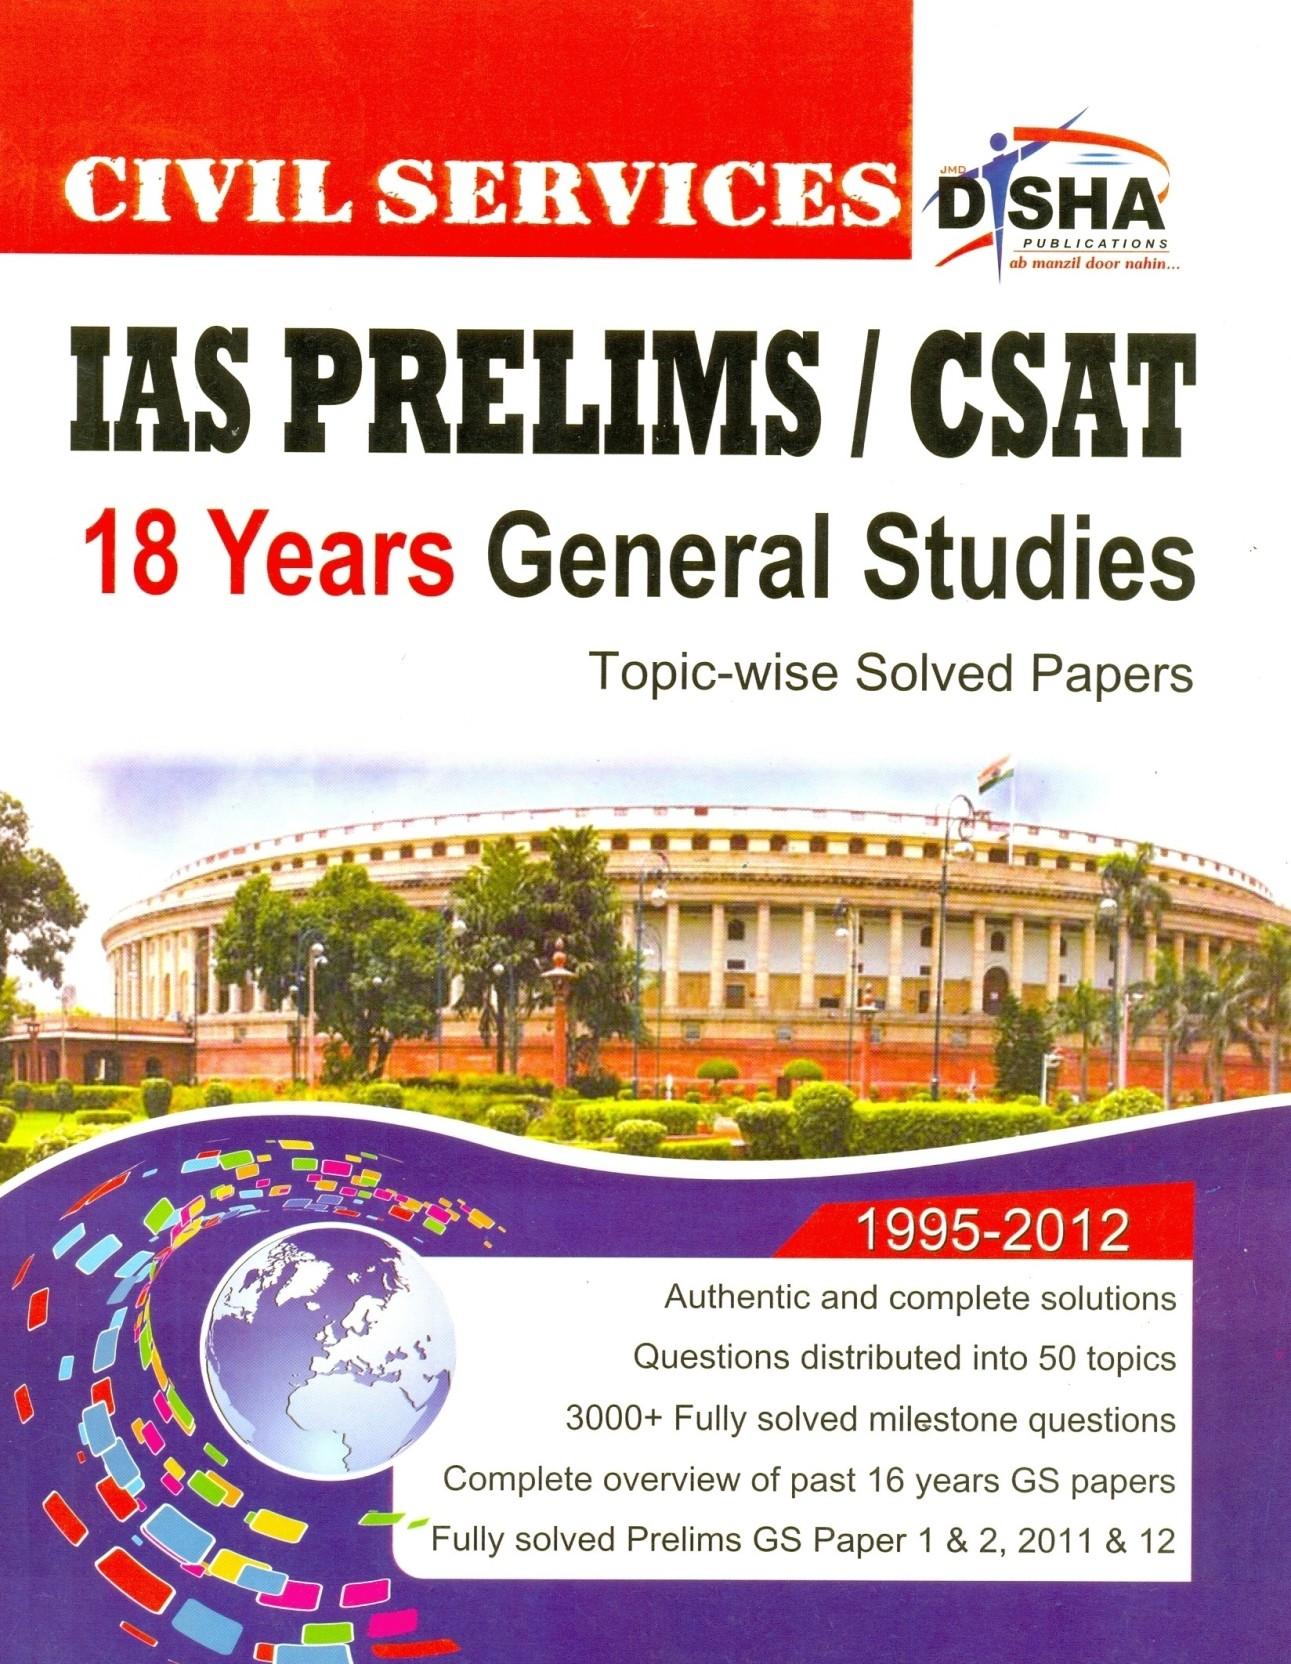 UPSC IAS Mains      GS paper   Insights